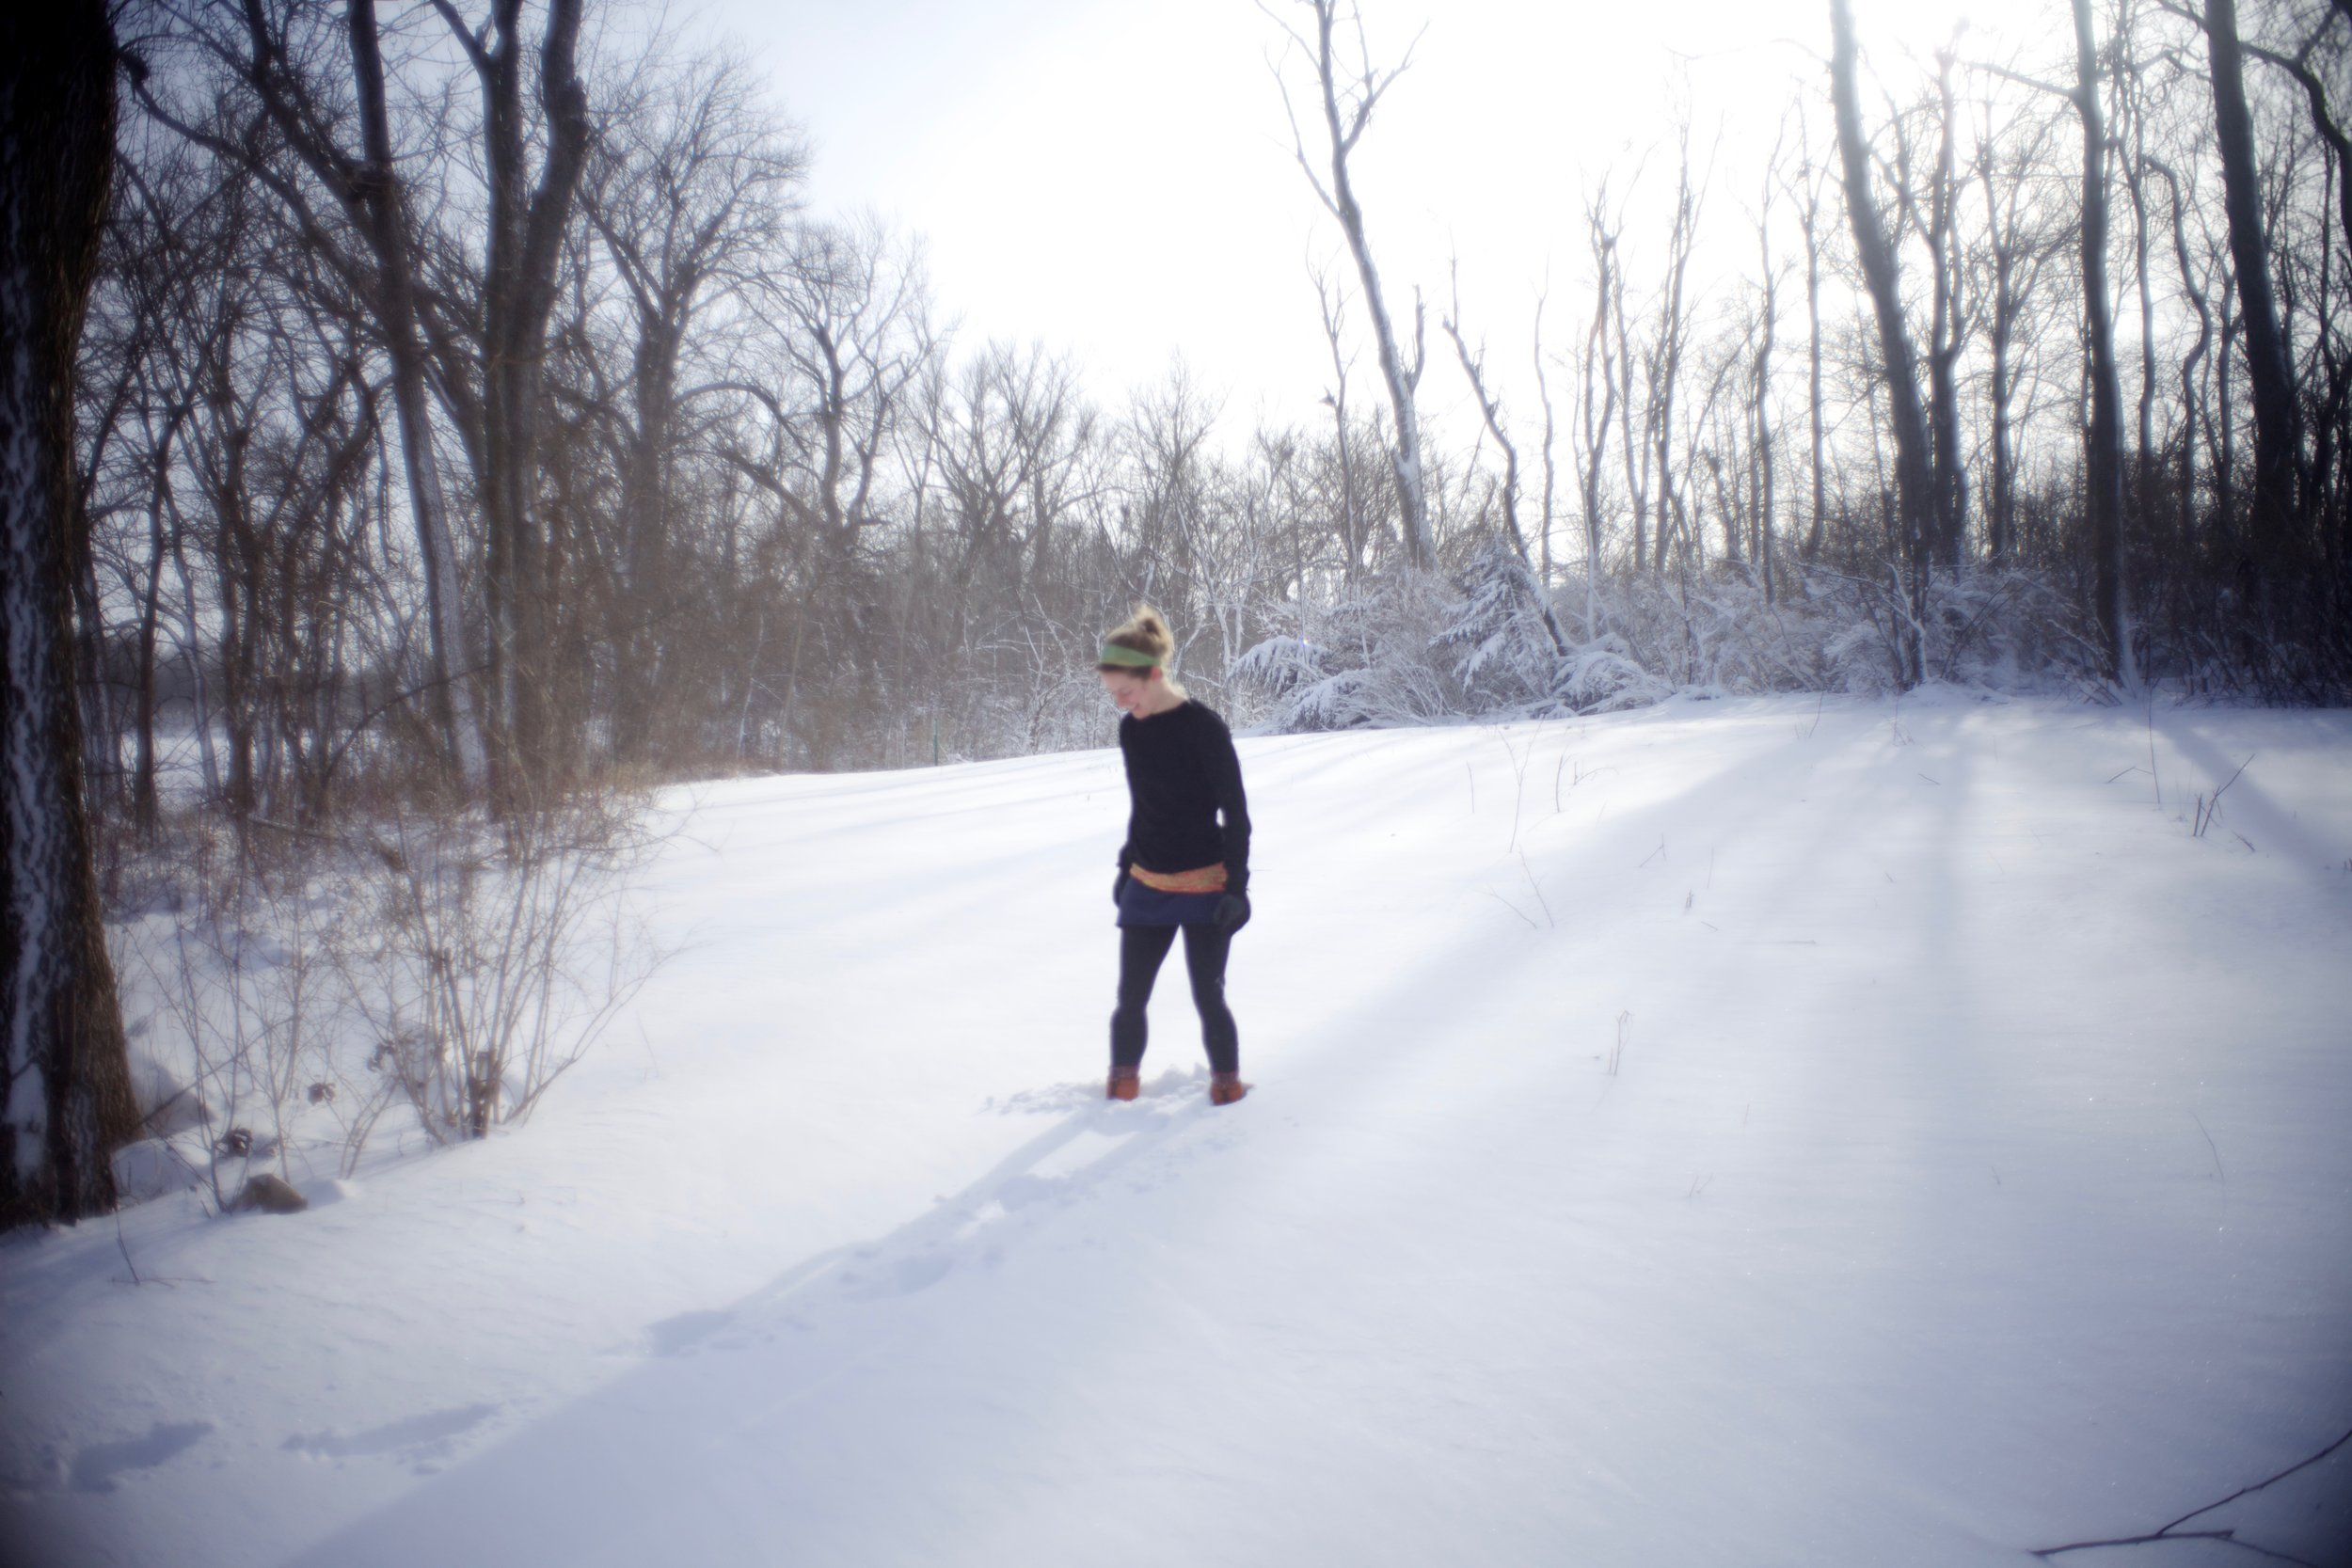 des moines winter hike